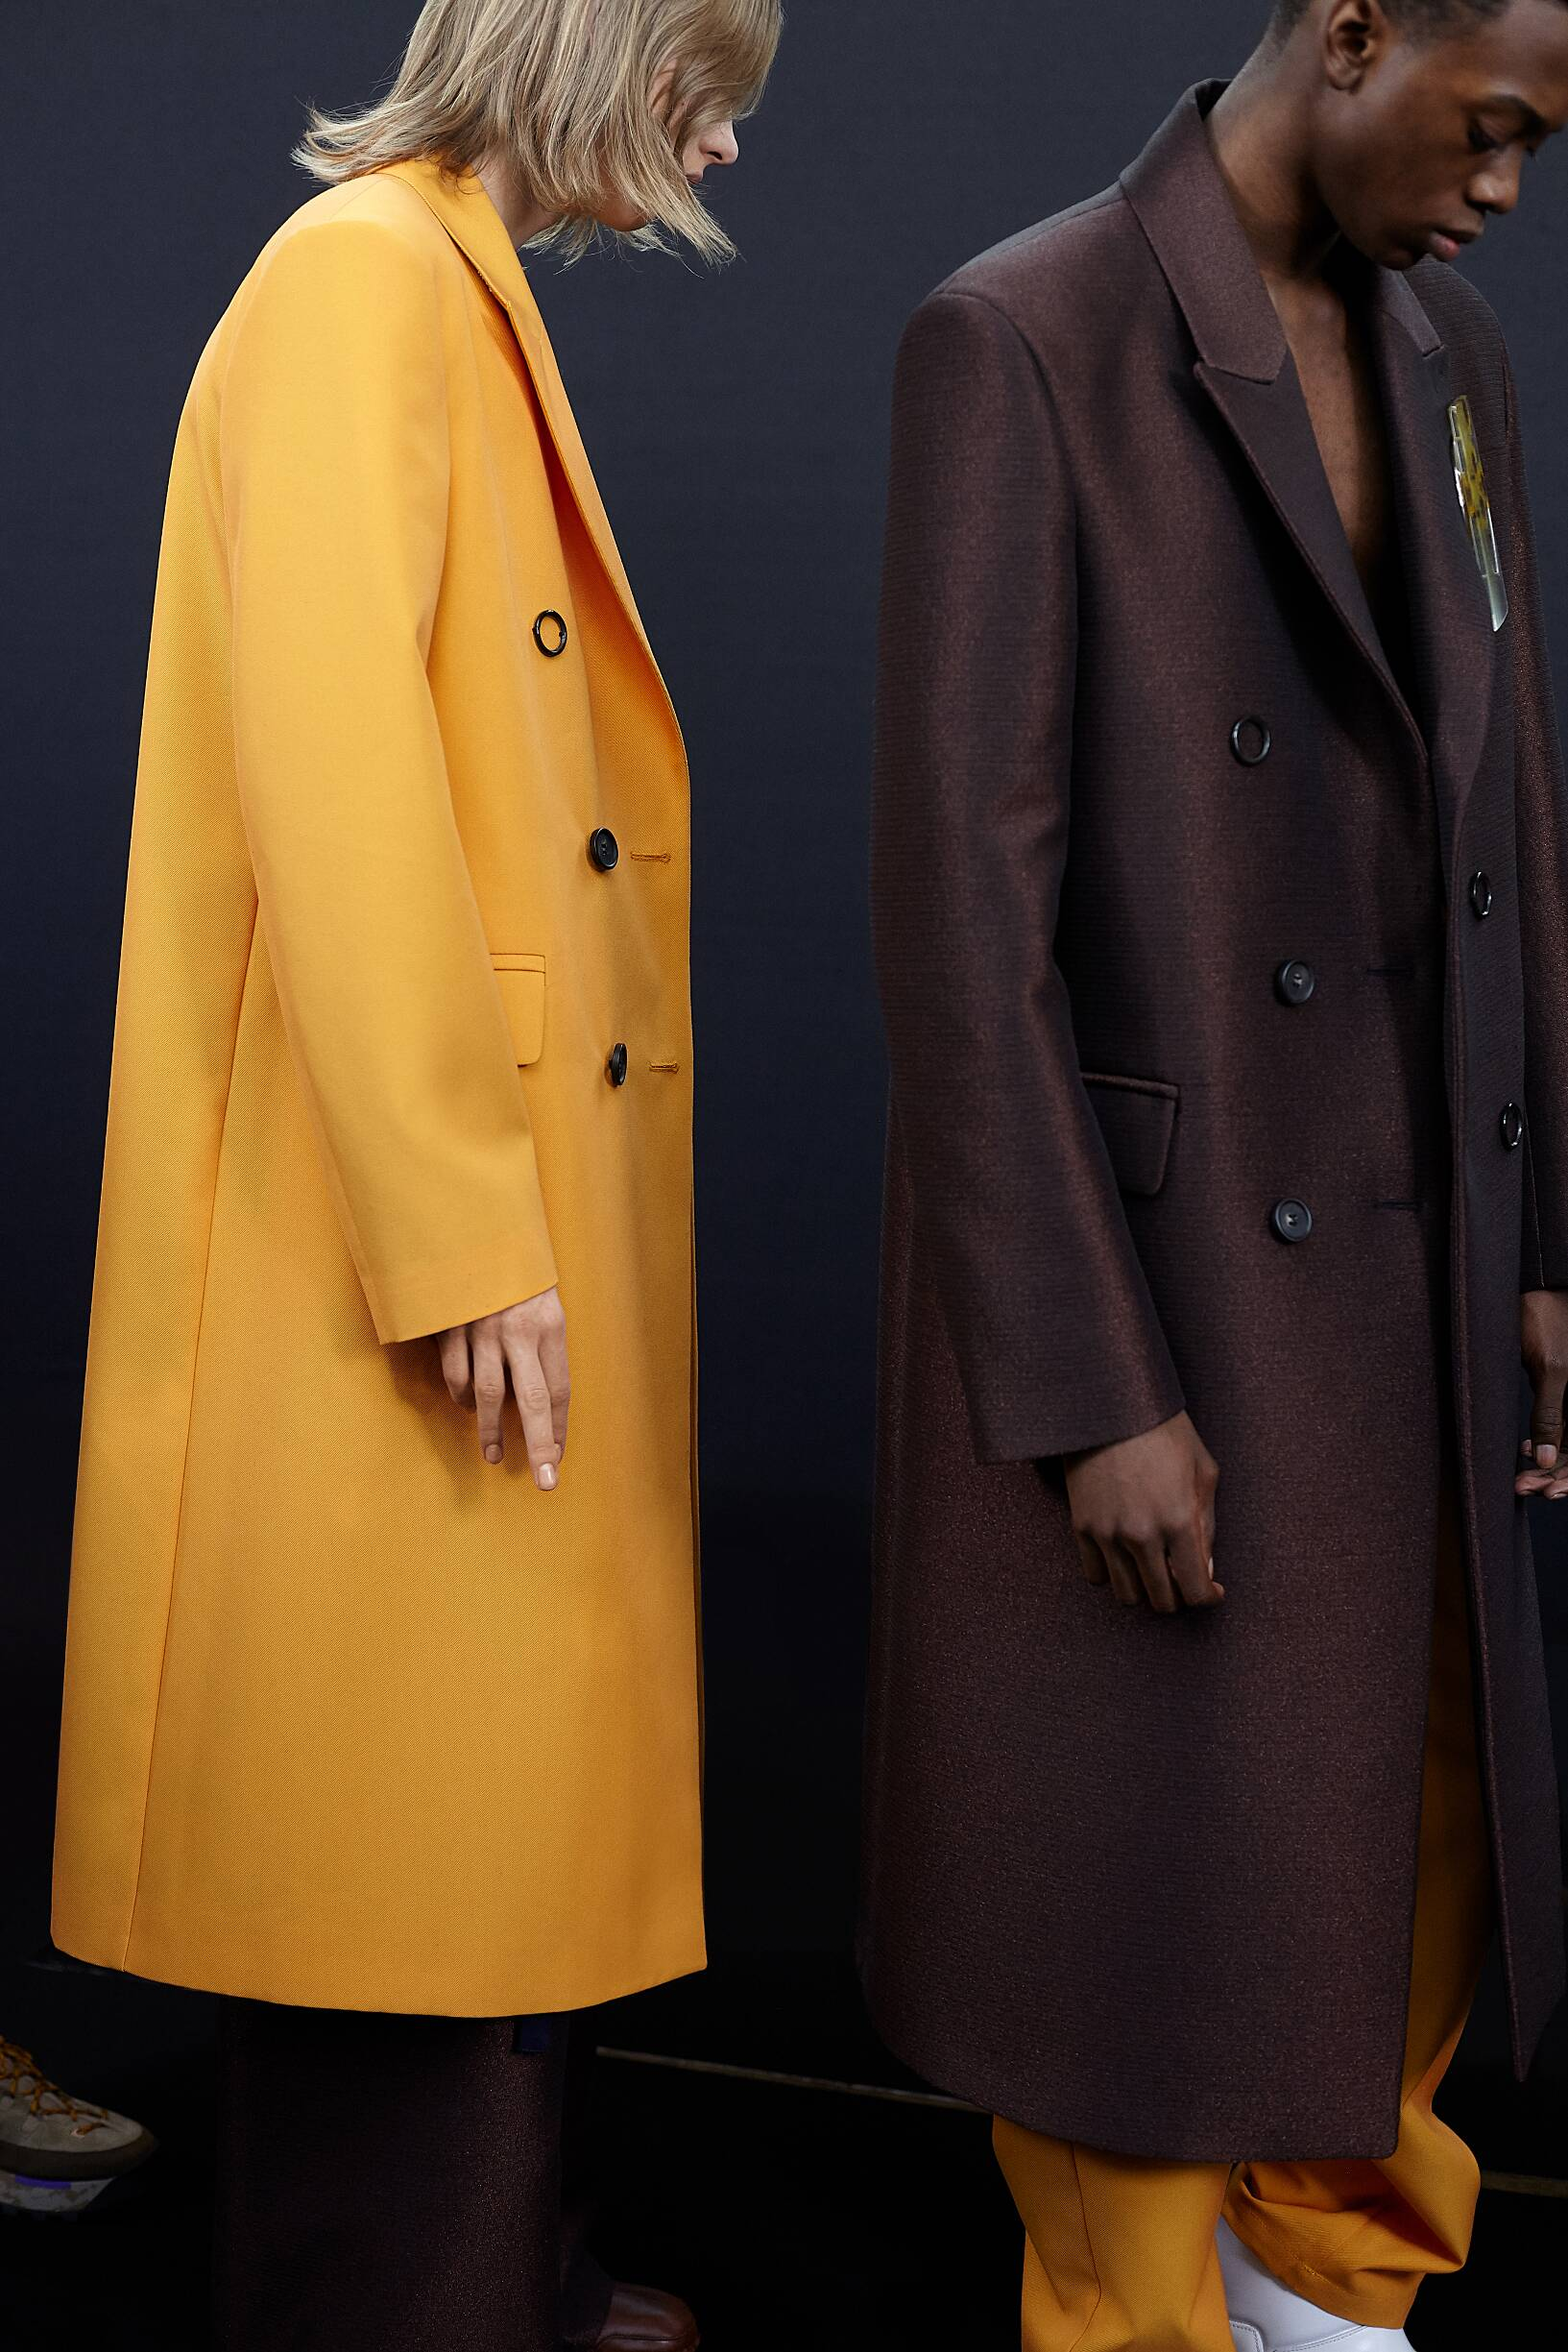 Models 2019 Fashion Backstage Acne Studios